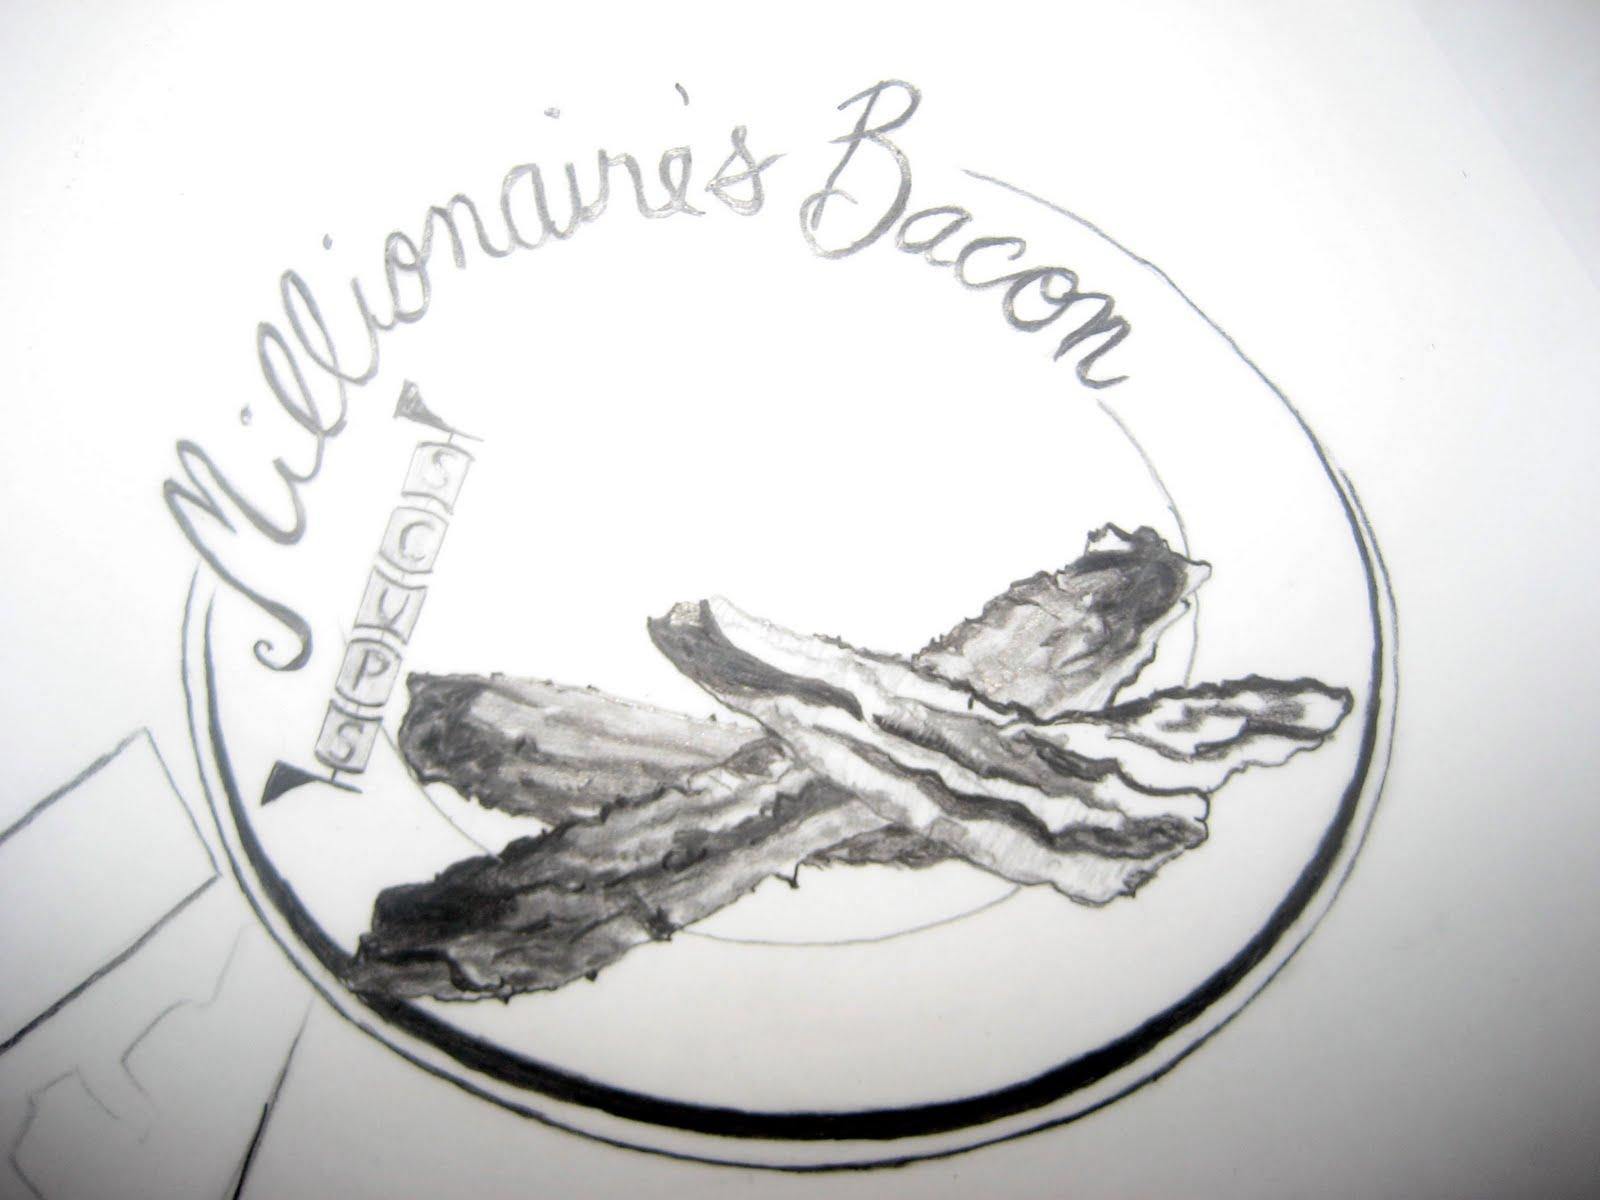 Millionaires Bacon   bkarmstrong Blog